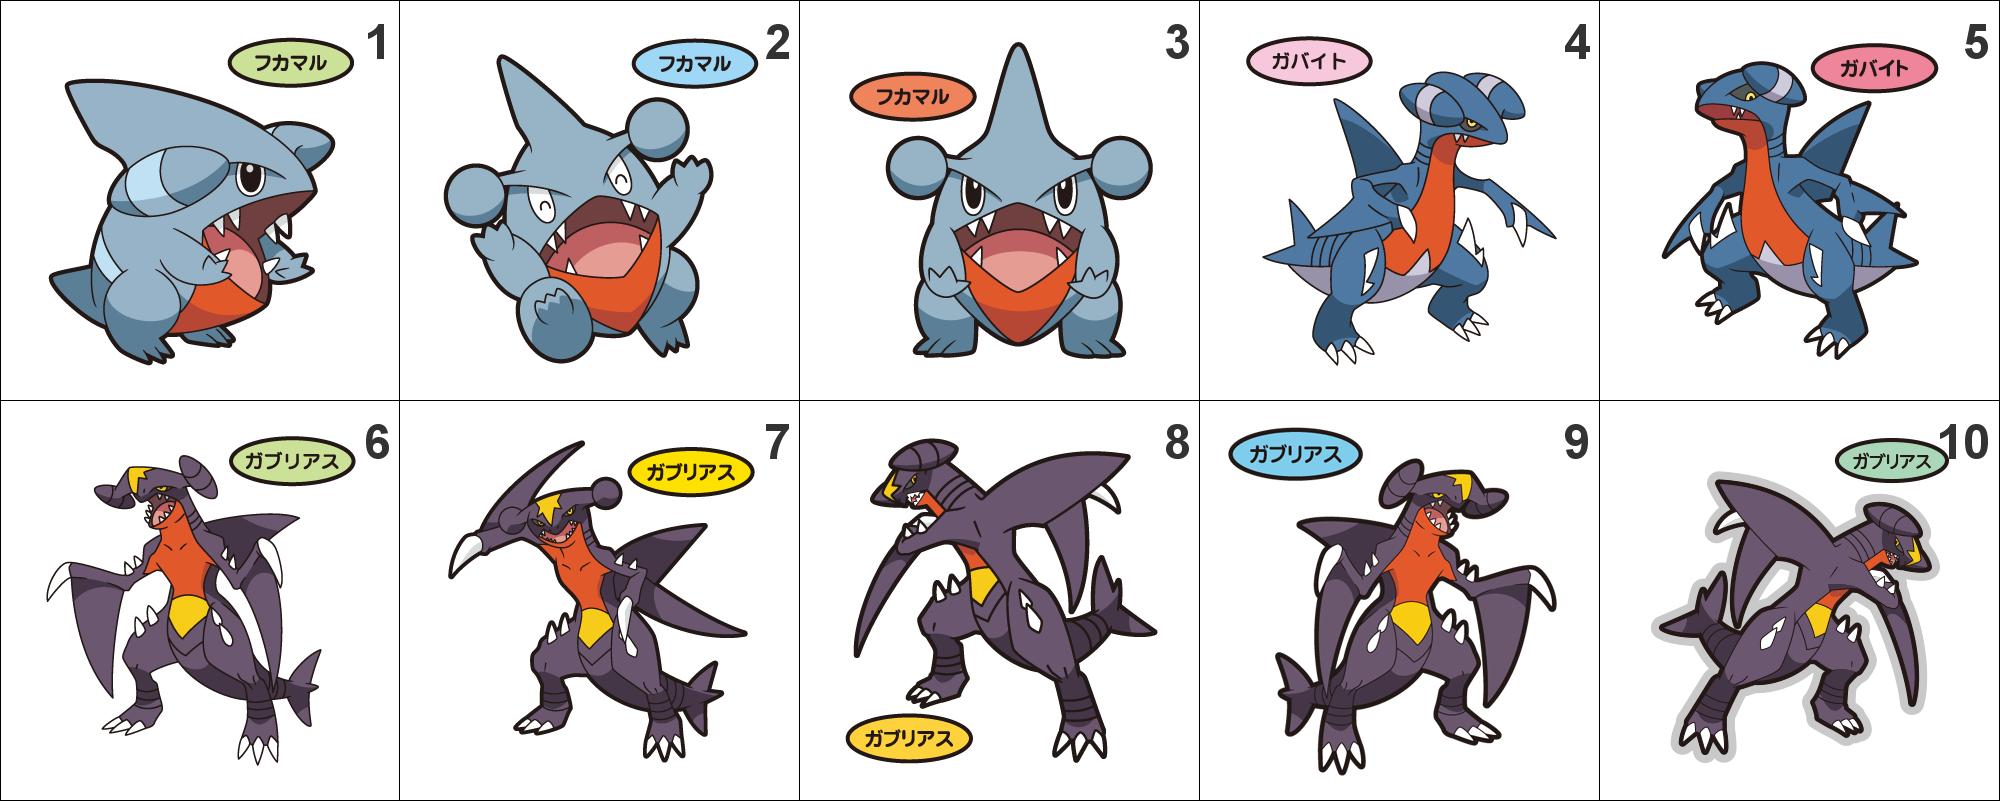 Gible Toy: 443, 444, 445 Gible, Gabite, Garchomp Pan Stickers Pokemon